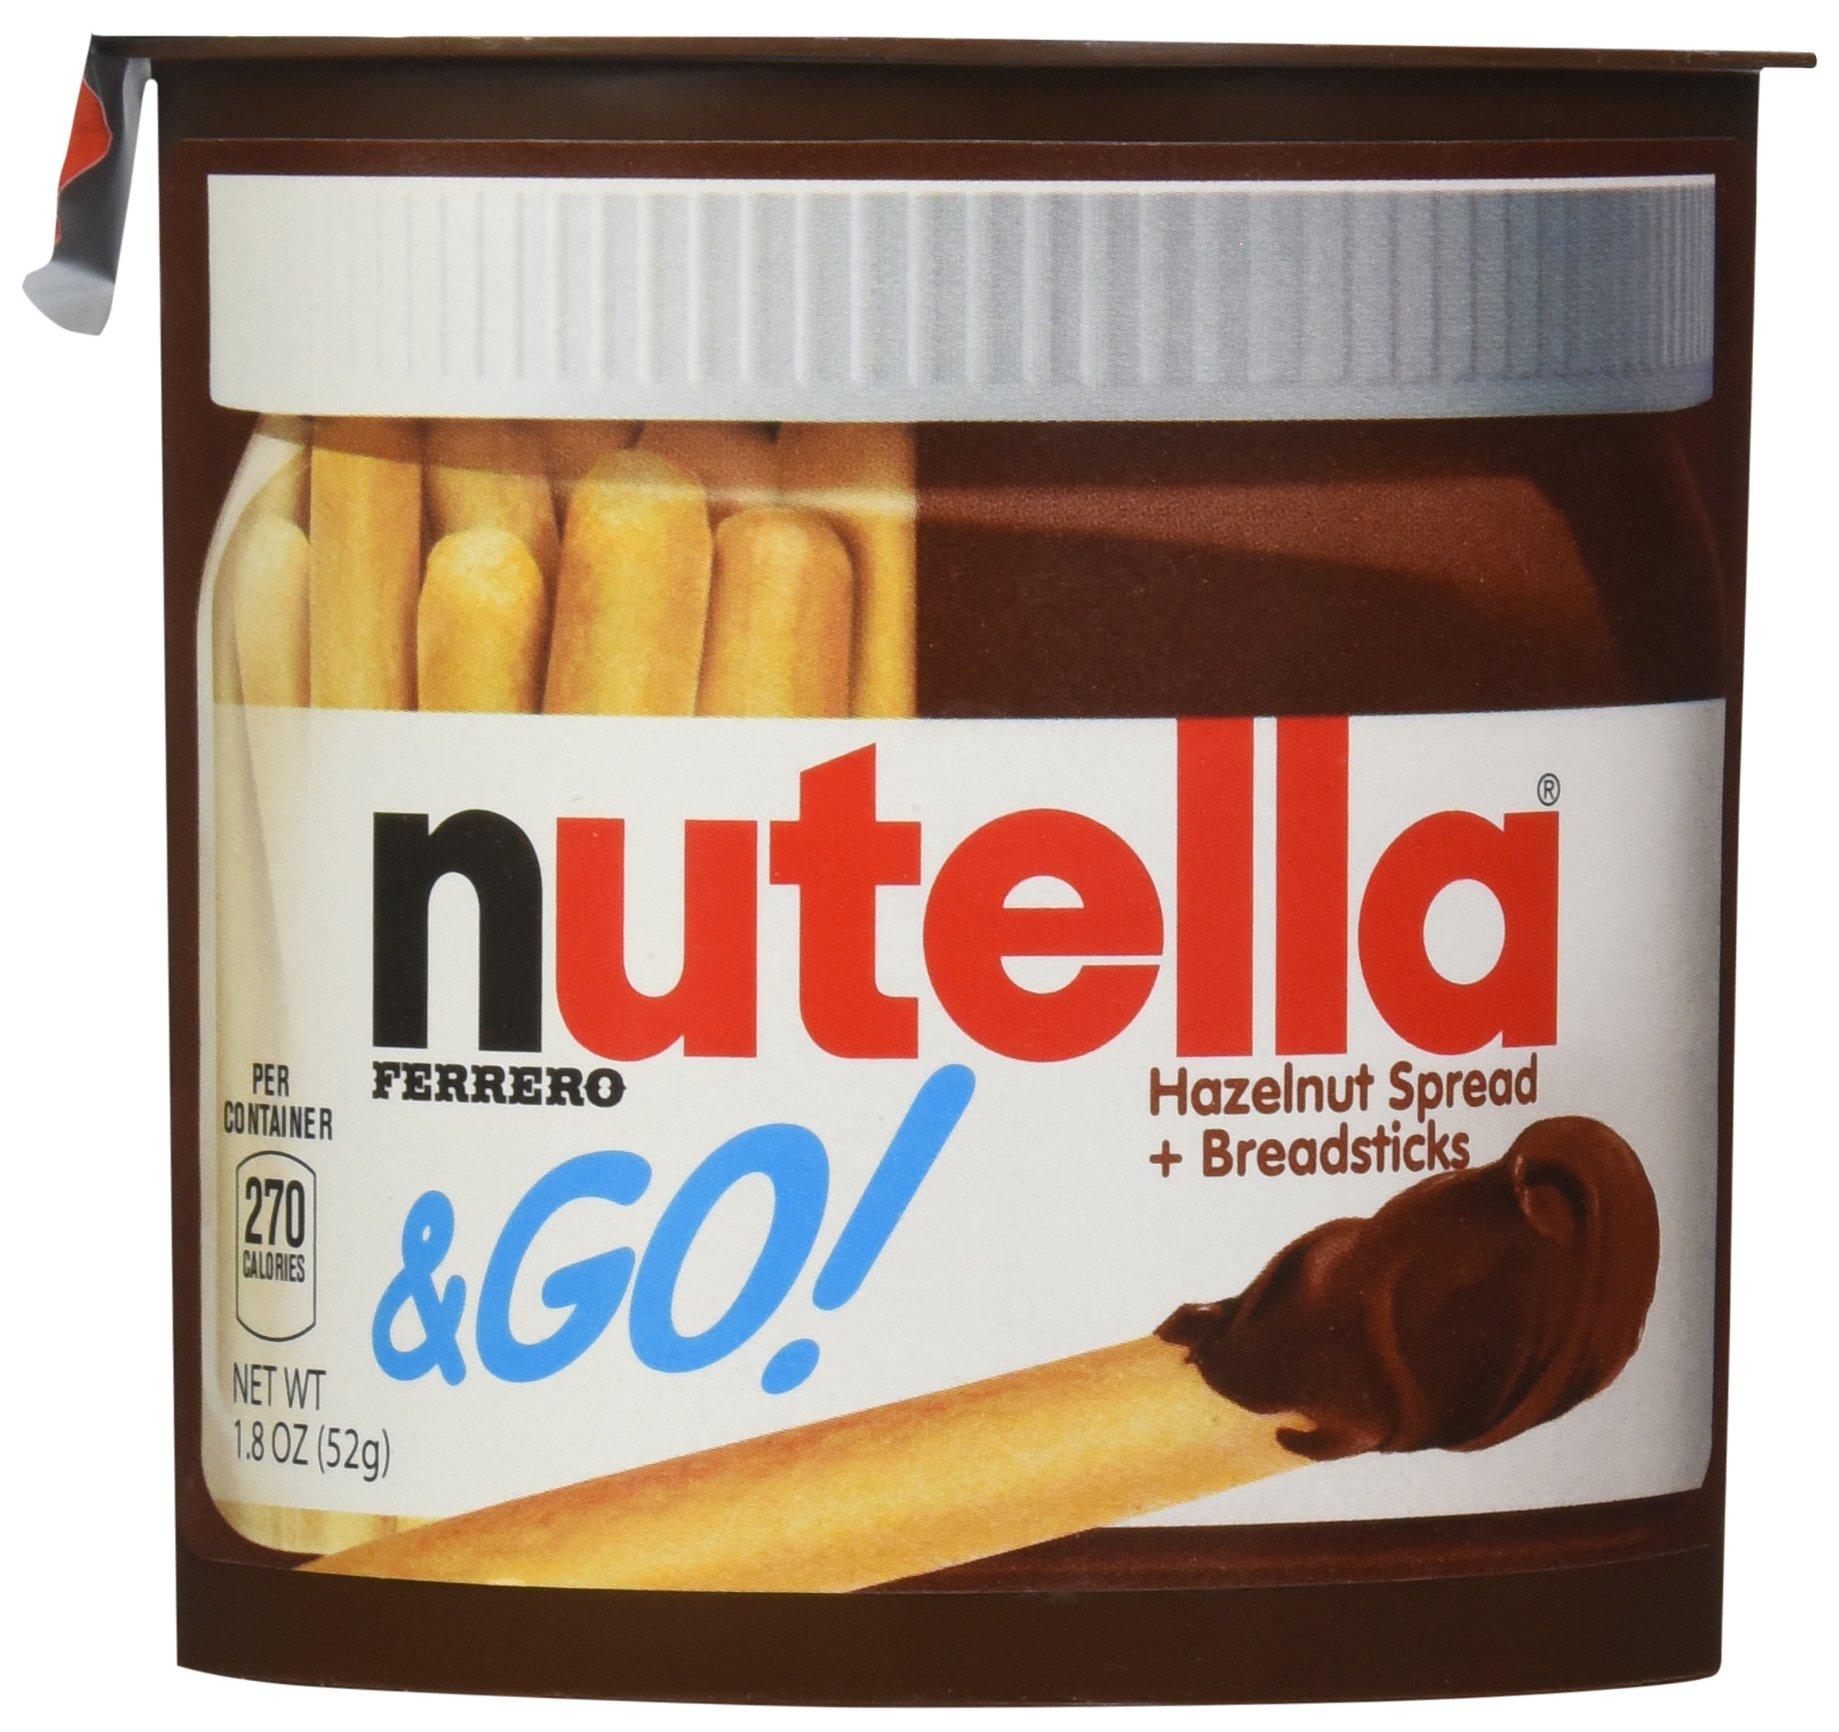 Nutella and Go, 1.8 oz